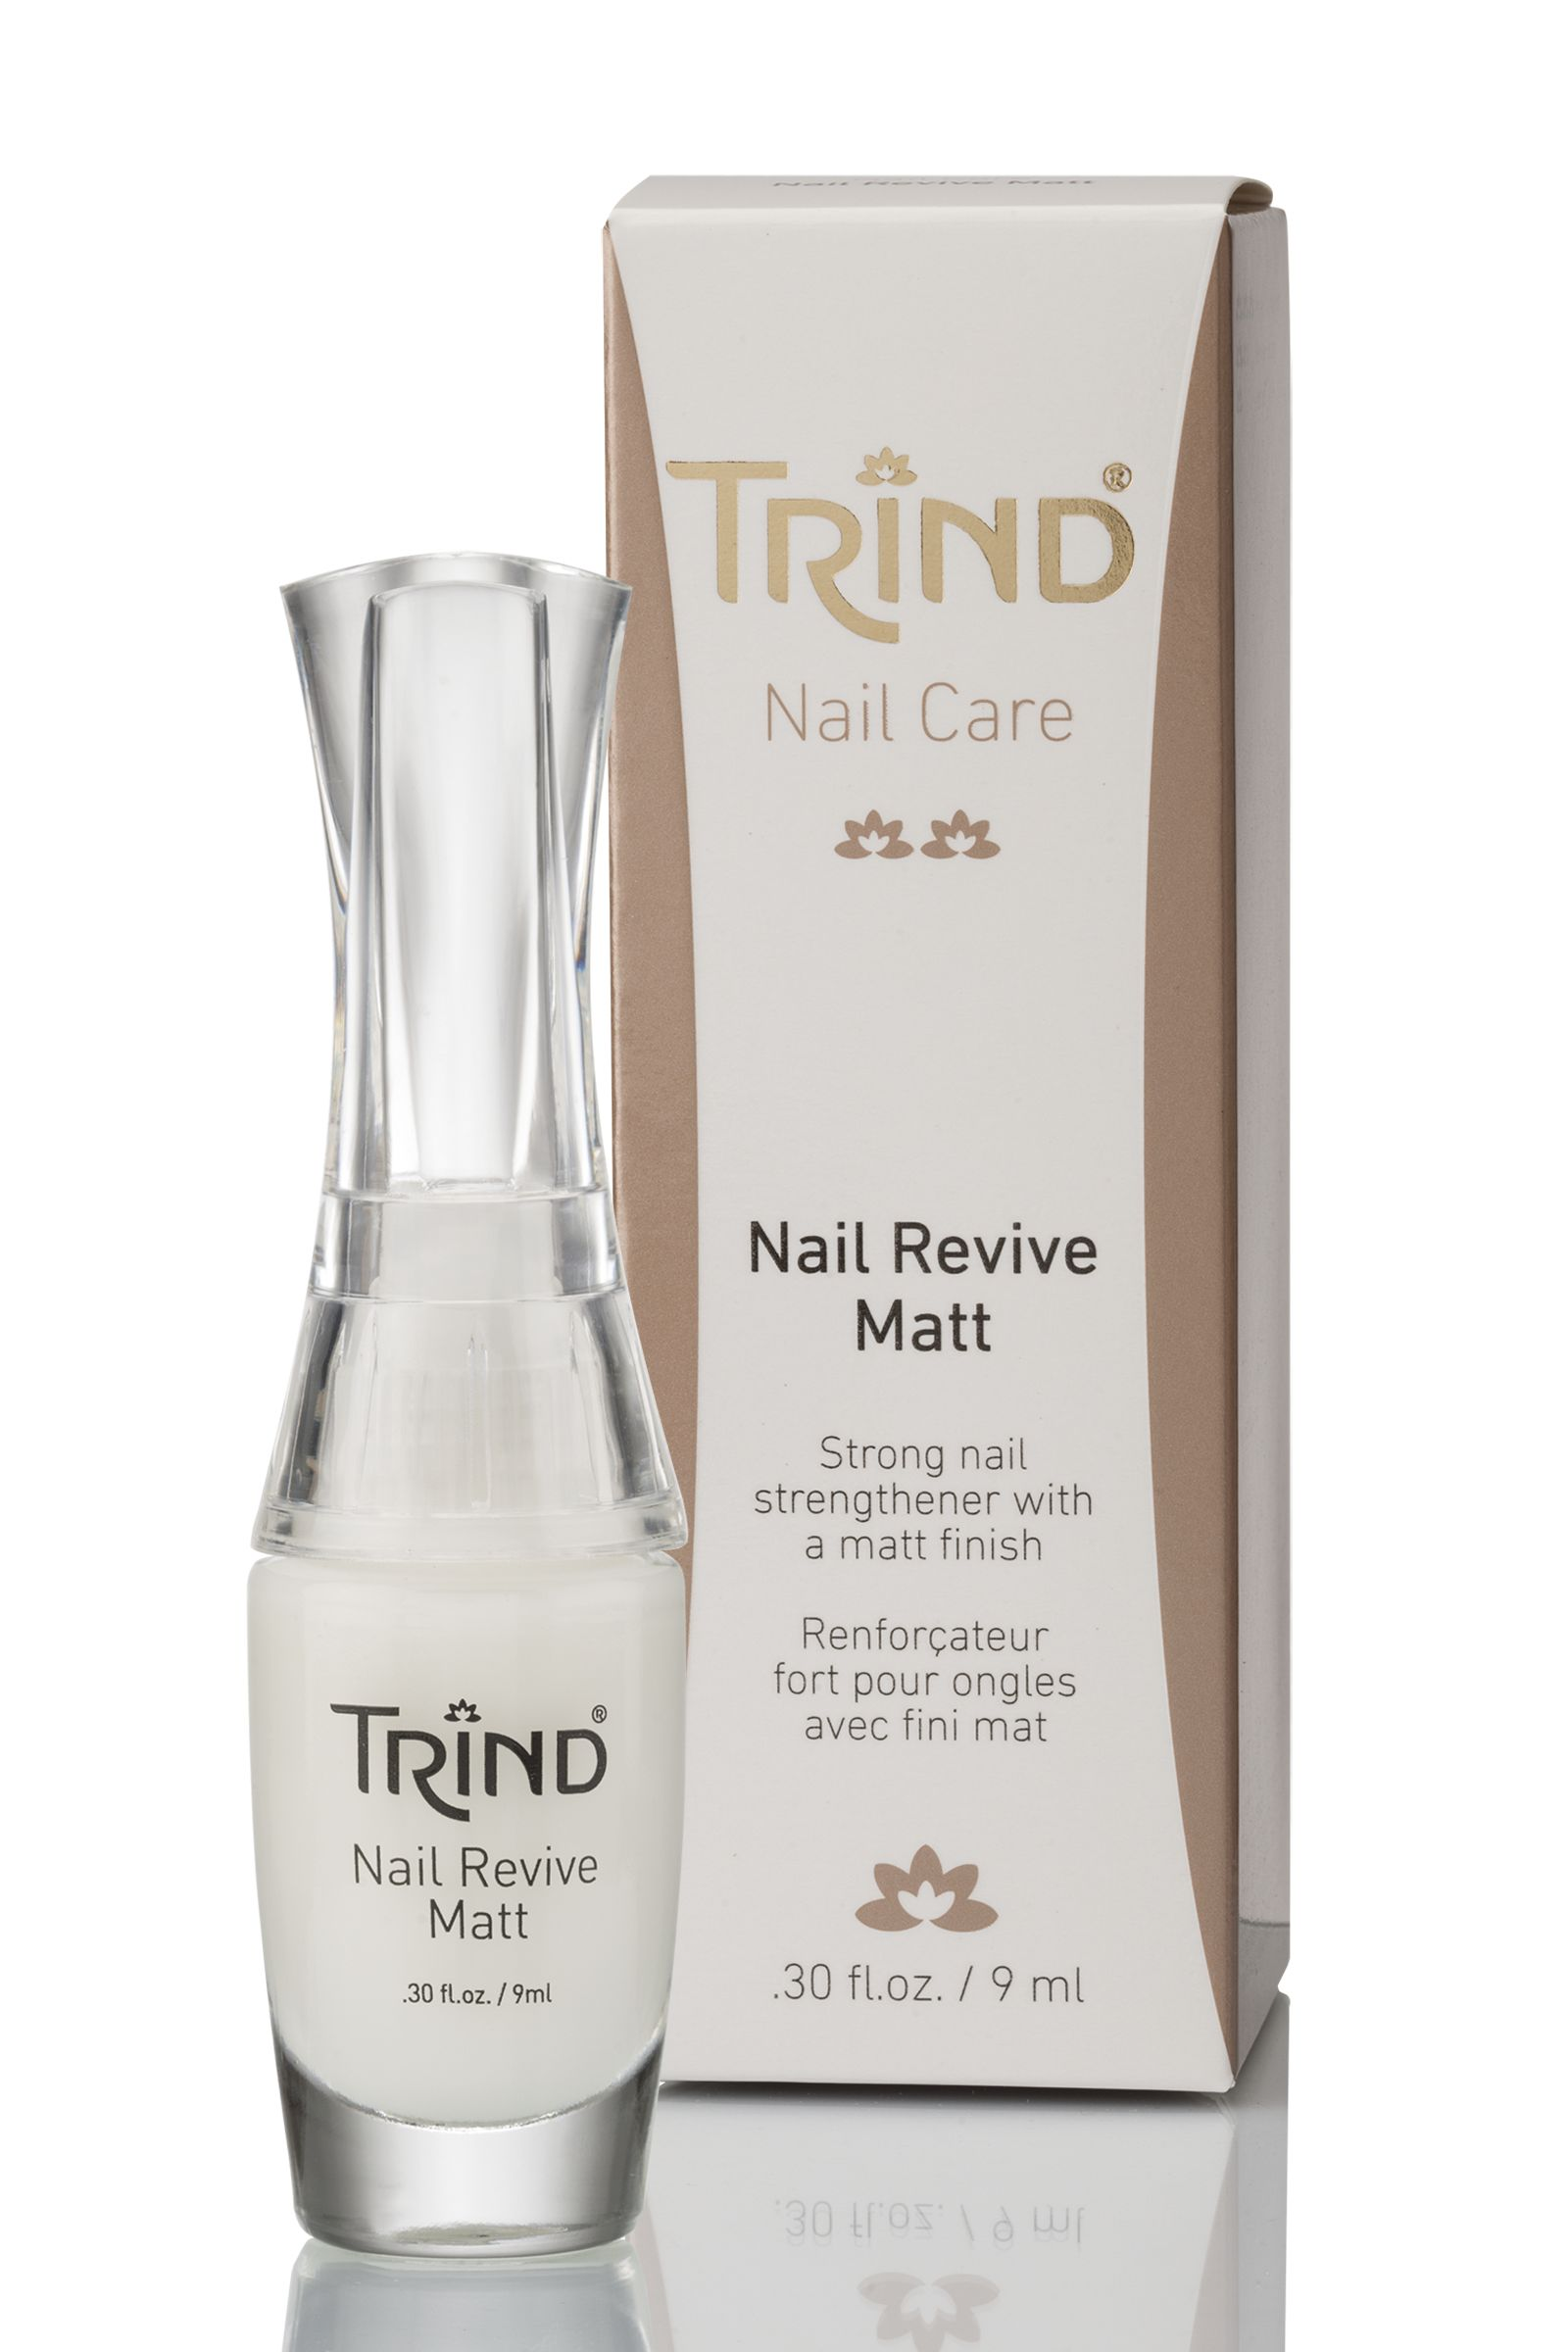 Nail Revive Matt Укрепитель ногтей матовый без формальдегида TRIND